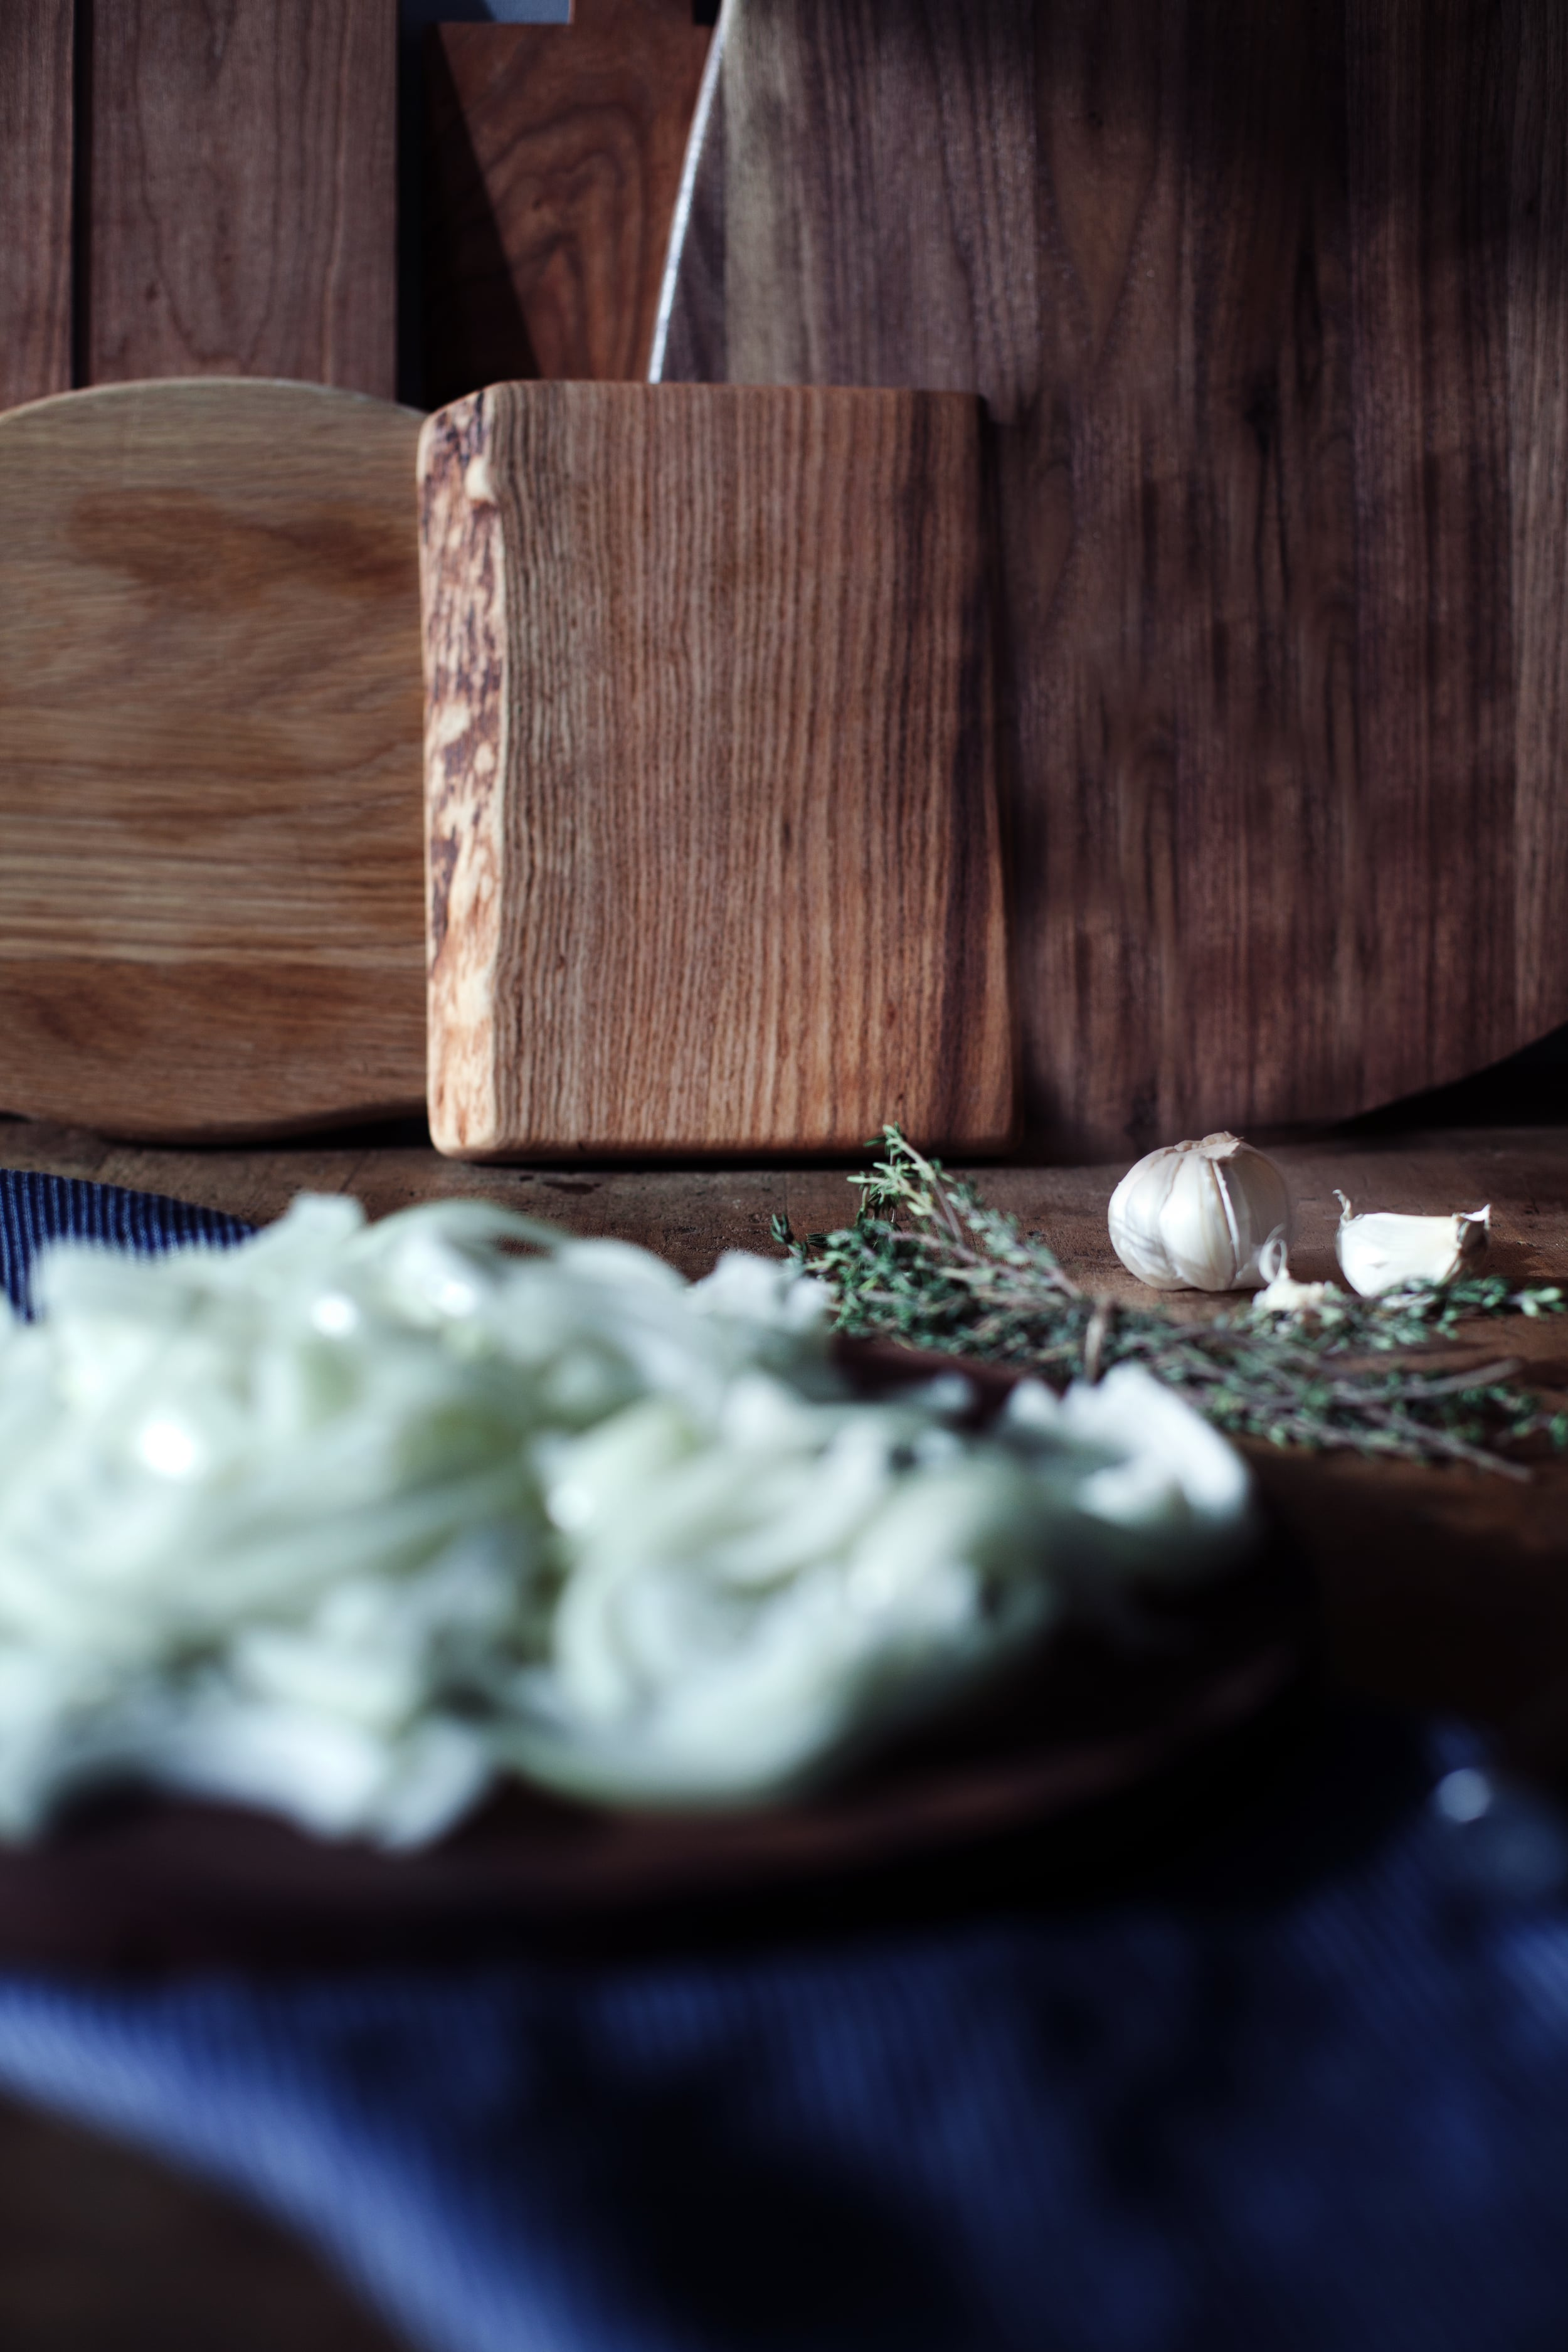 french onion soup iii.jpg